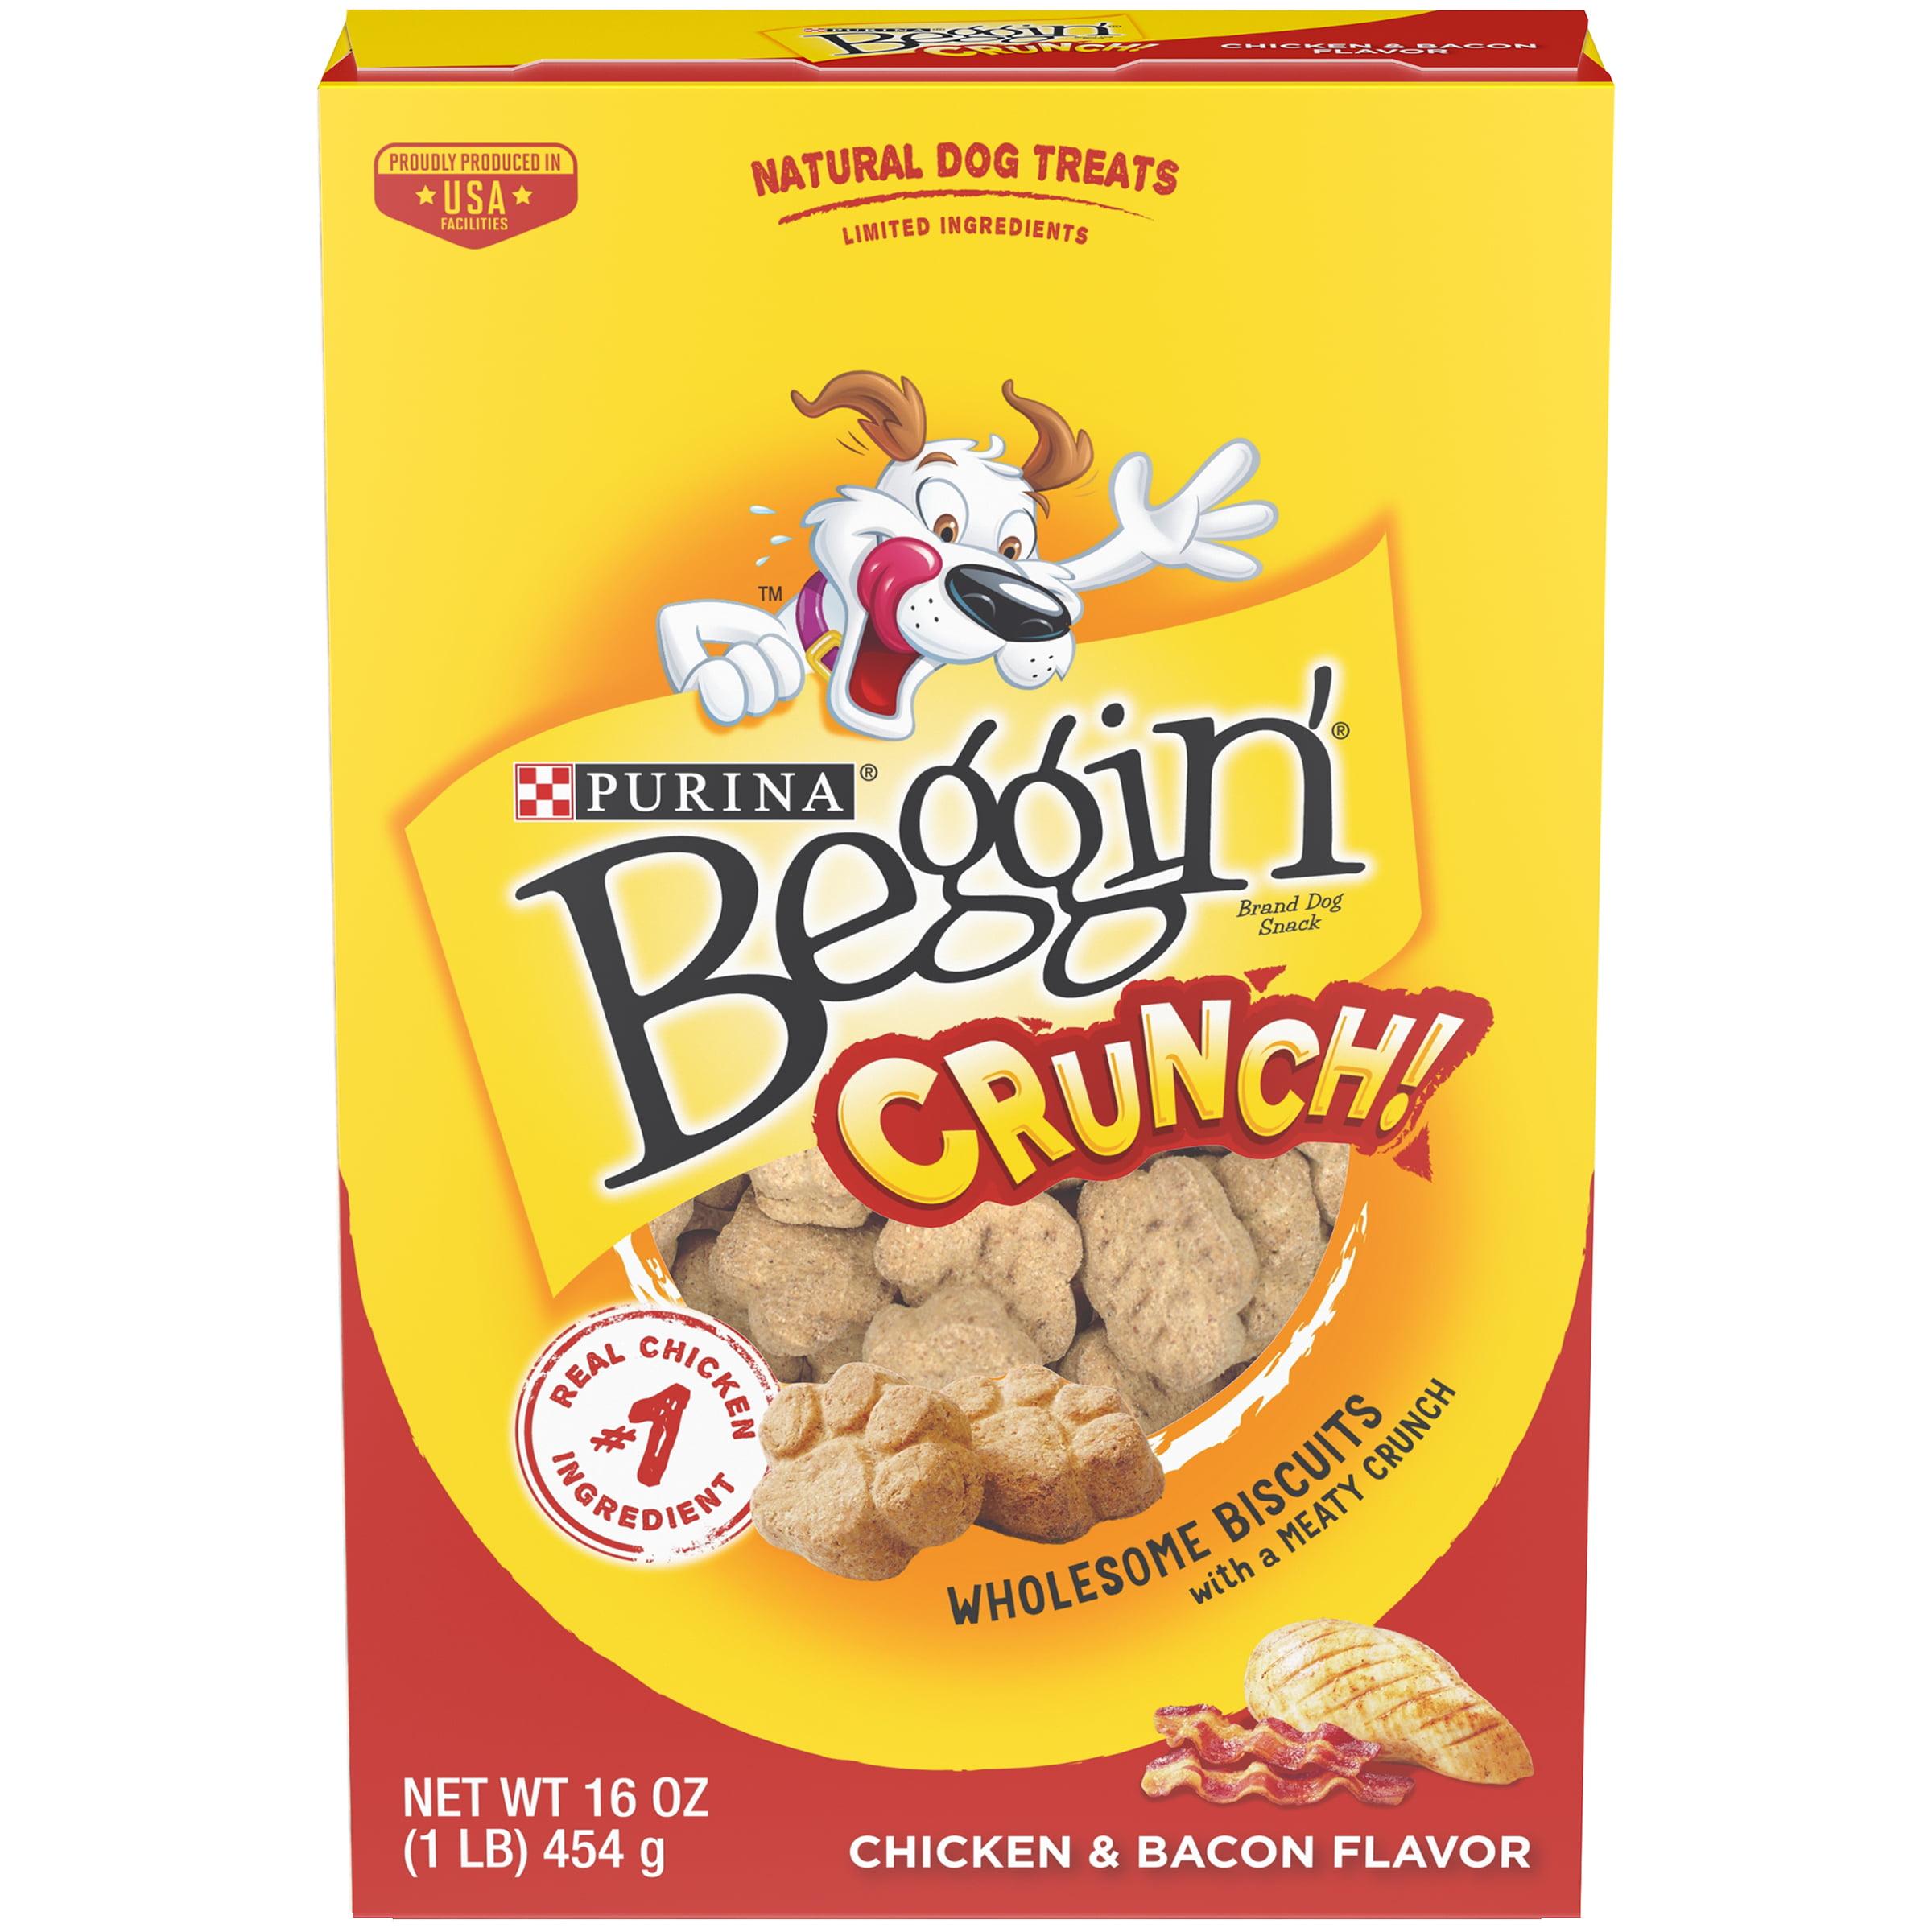 Purina Beggin' Crunch Chicken & Bacon Flavor Dog Treats 16 oz. Box